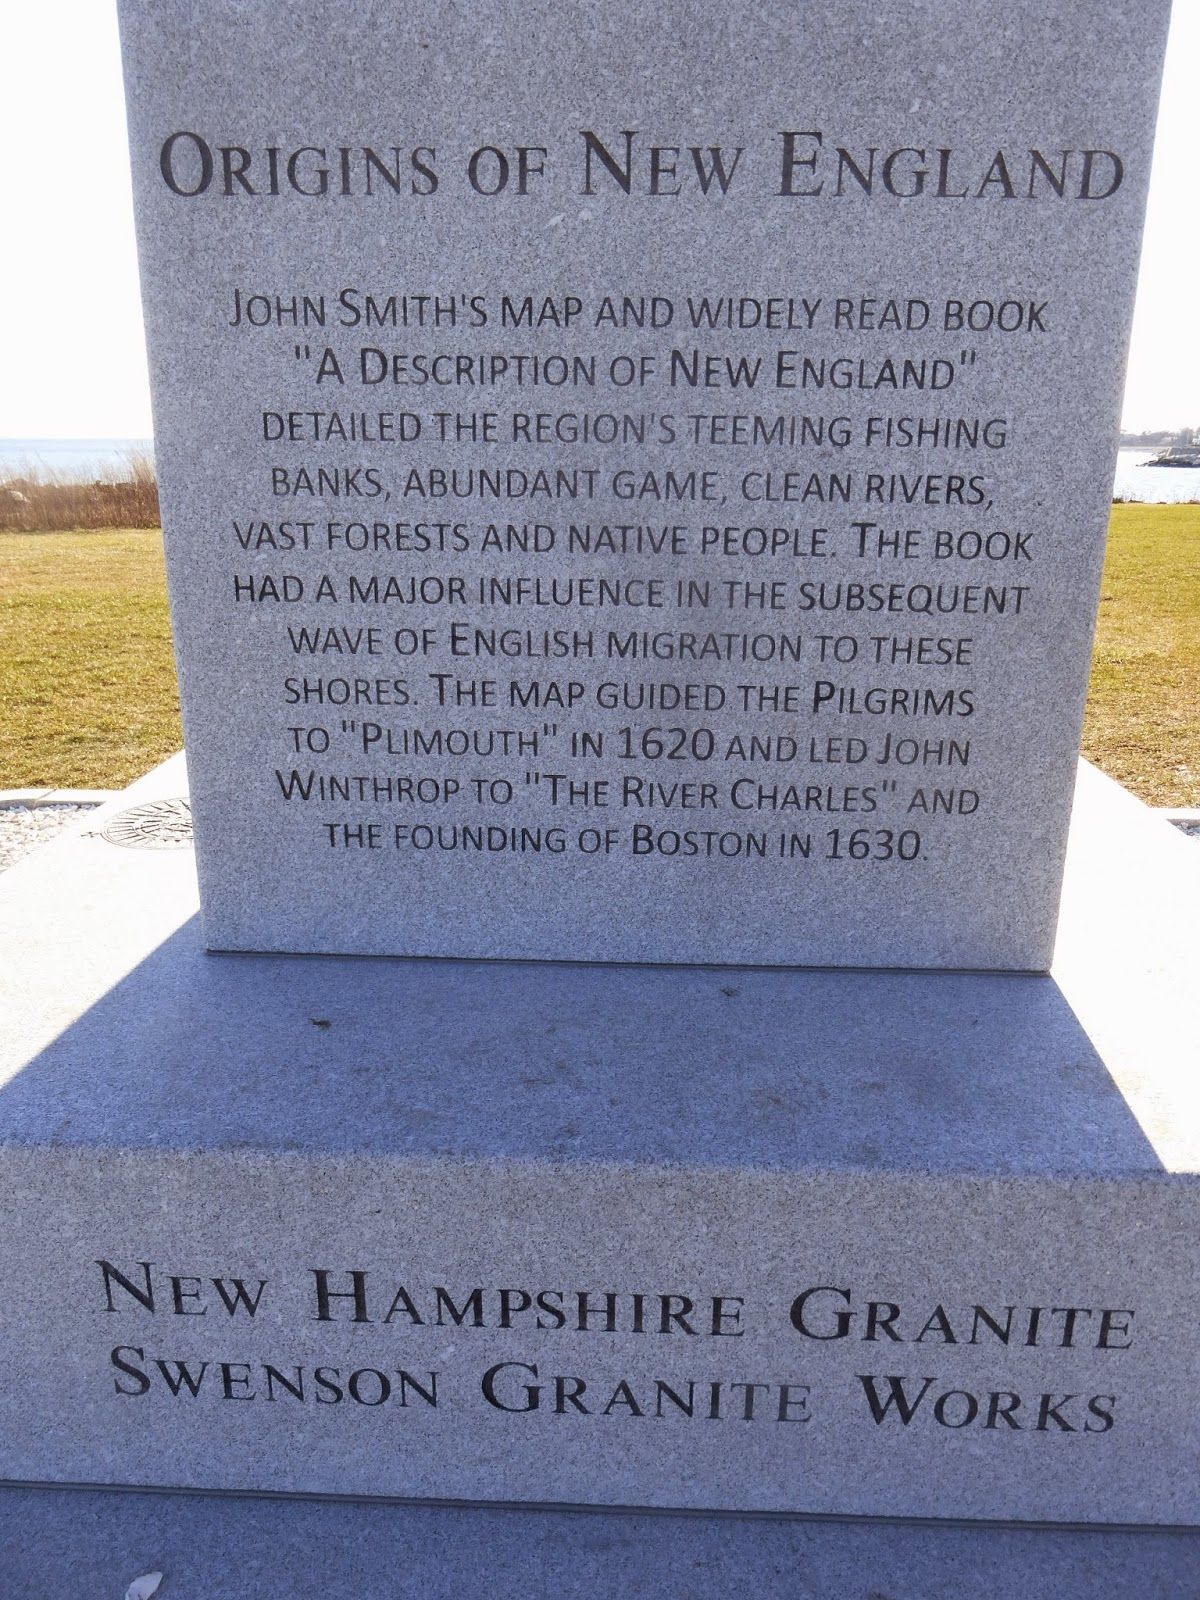 Nutfield Genealogy: 400th Anniversary of John Smith's